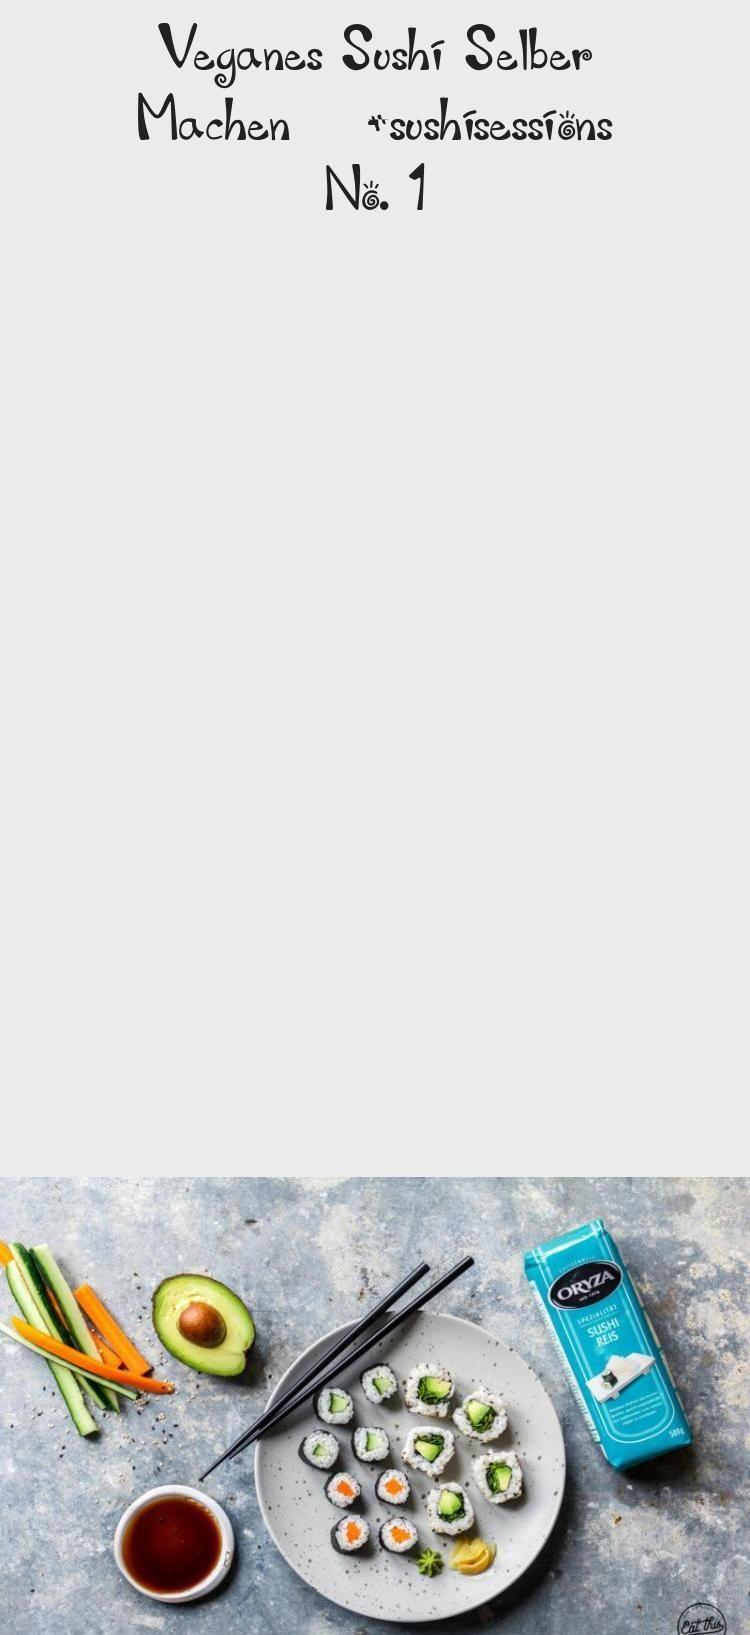 Veganes Sushi selber machen #selbermachenHolz #Duschgelselbermachen #Joghurtselbermachen #Granolaselbermachen #Kneteselbermachen #frischkäseselbermachen Veganes Sushi selber machen #selbermachenHolz #Duschgelselbermachen #Joghurtselbermachen #Granolaselbermachen #Kneteselbermachen #frischkäseselbermachen